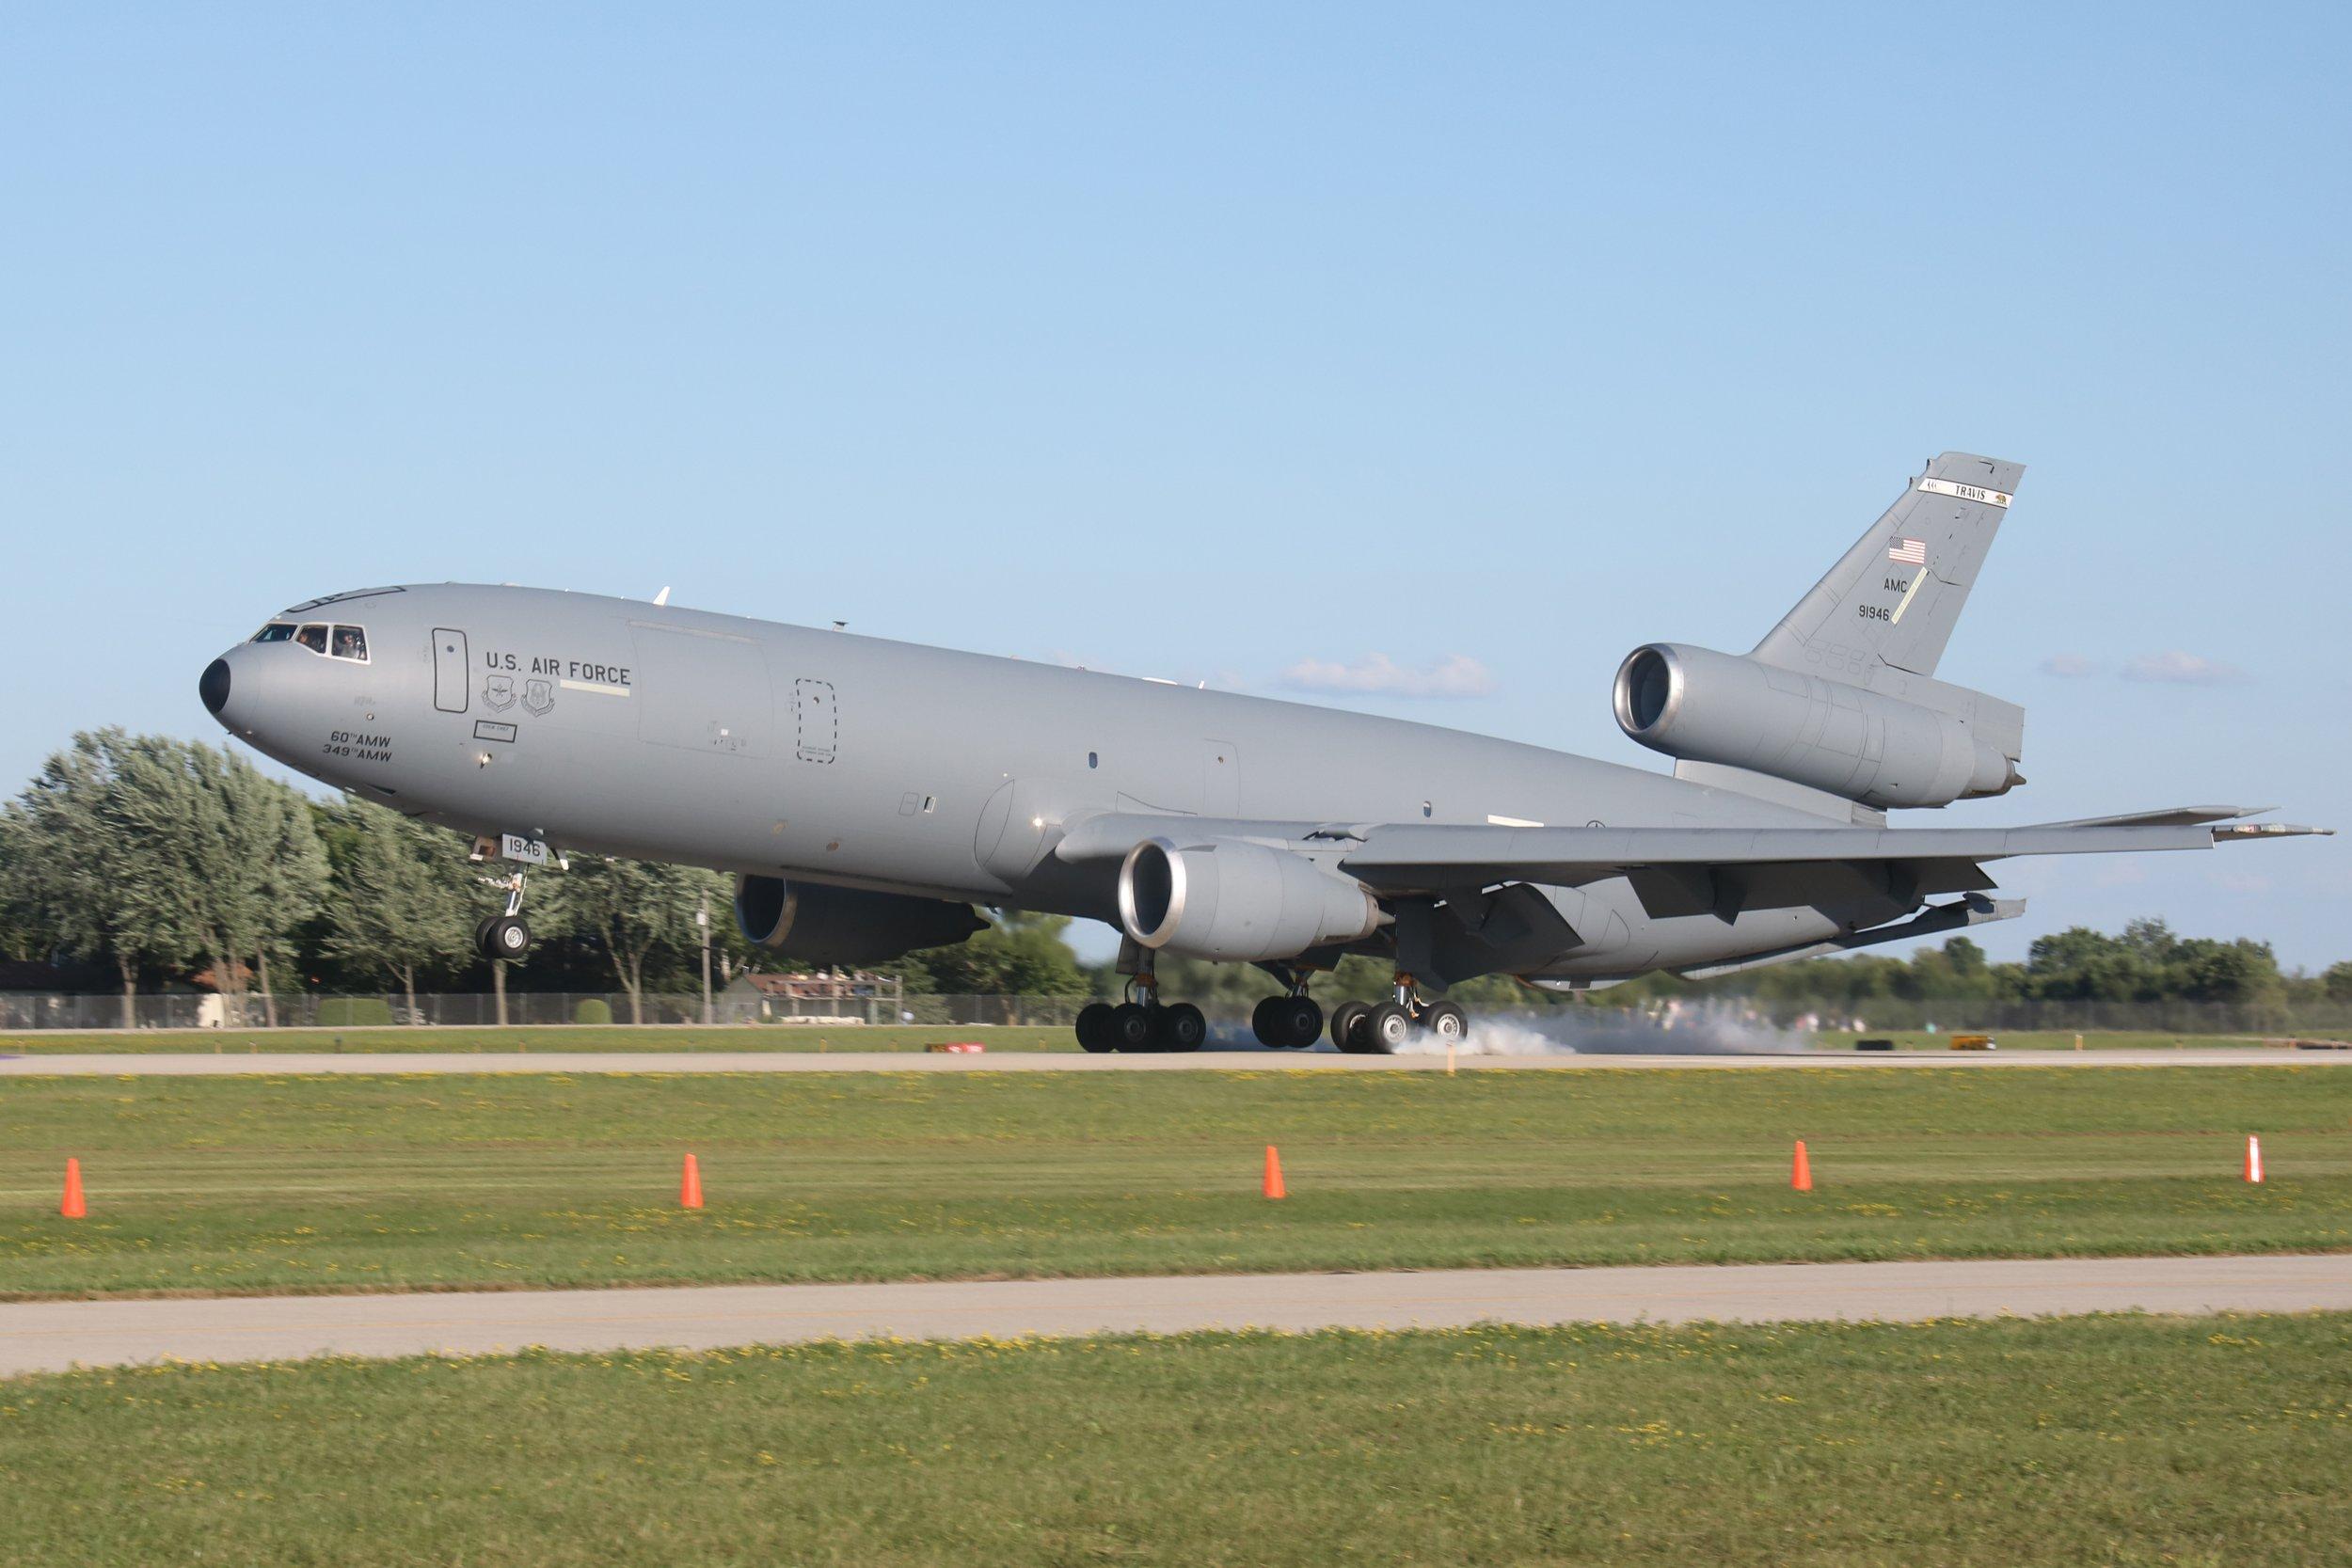 79-1946 USAF McDonnell Douglas KC-10A landing at Oshkosh 24th July 2018 taken by Andrew Tenny